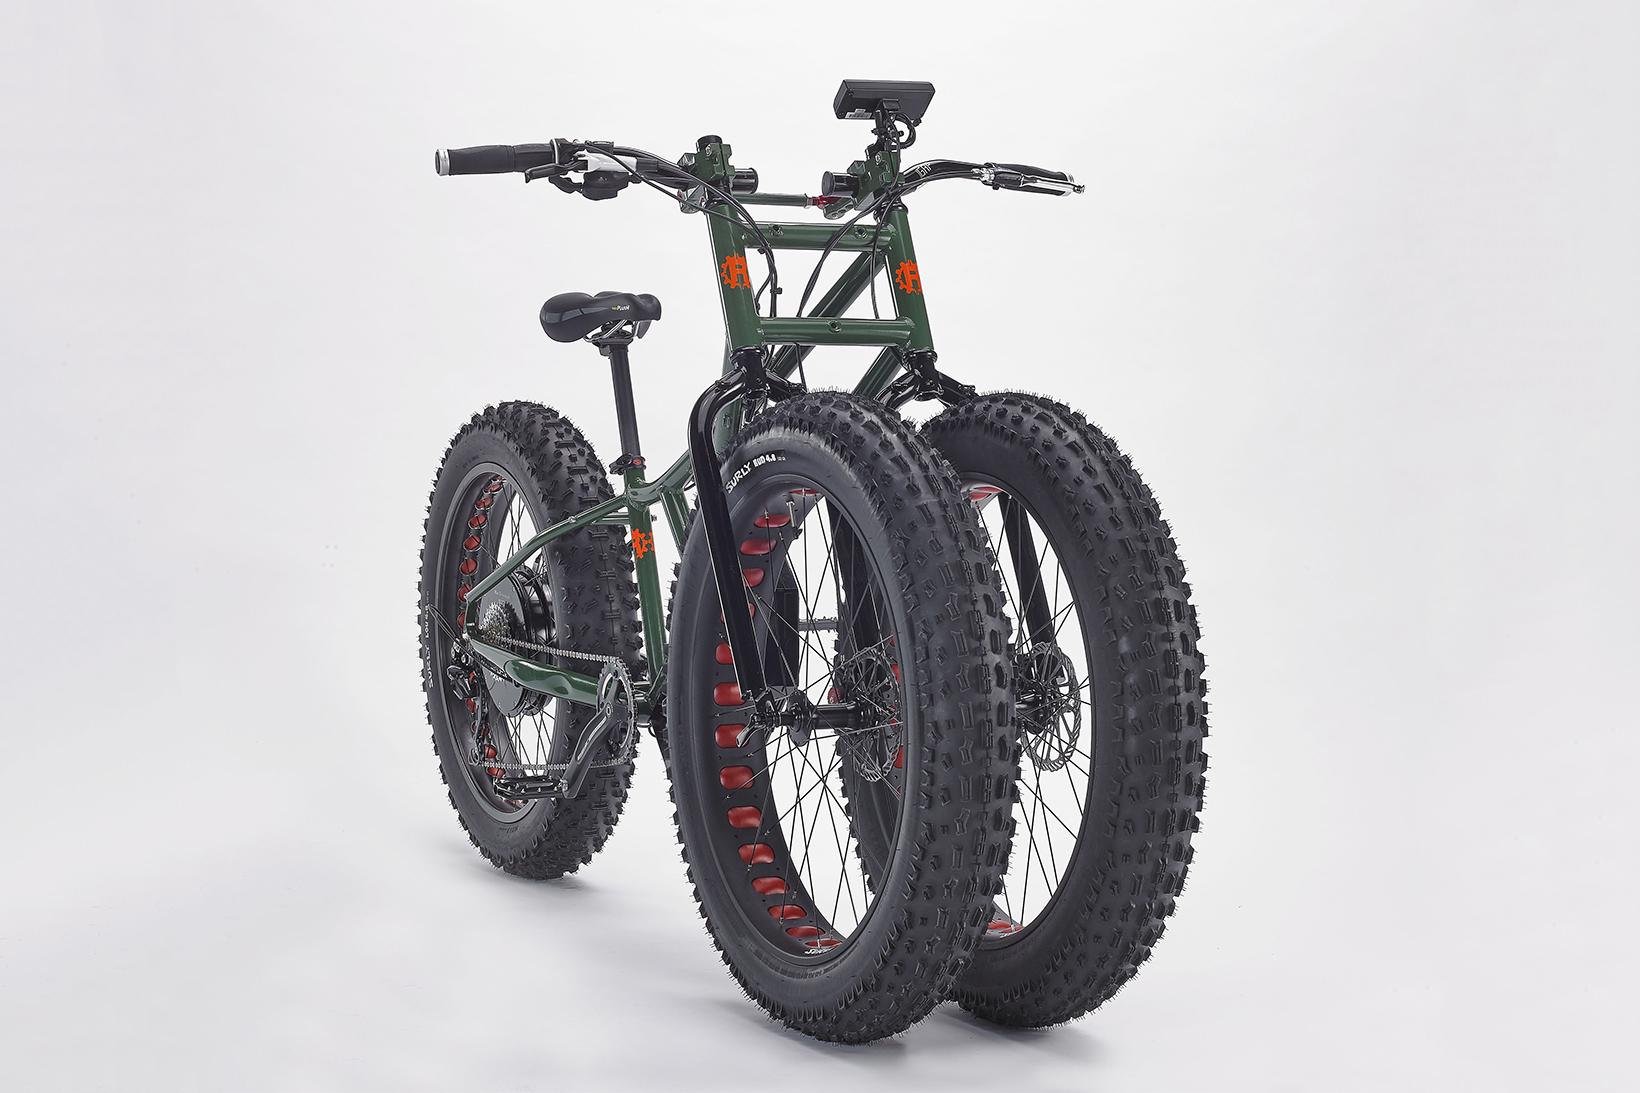 The Big Wheel Is Back: Rungu Introduces Electric Juggernaut Bike